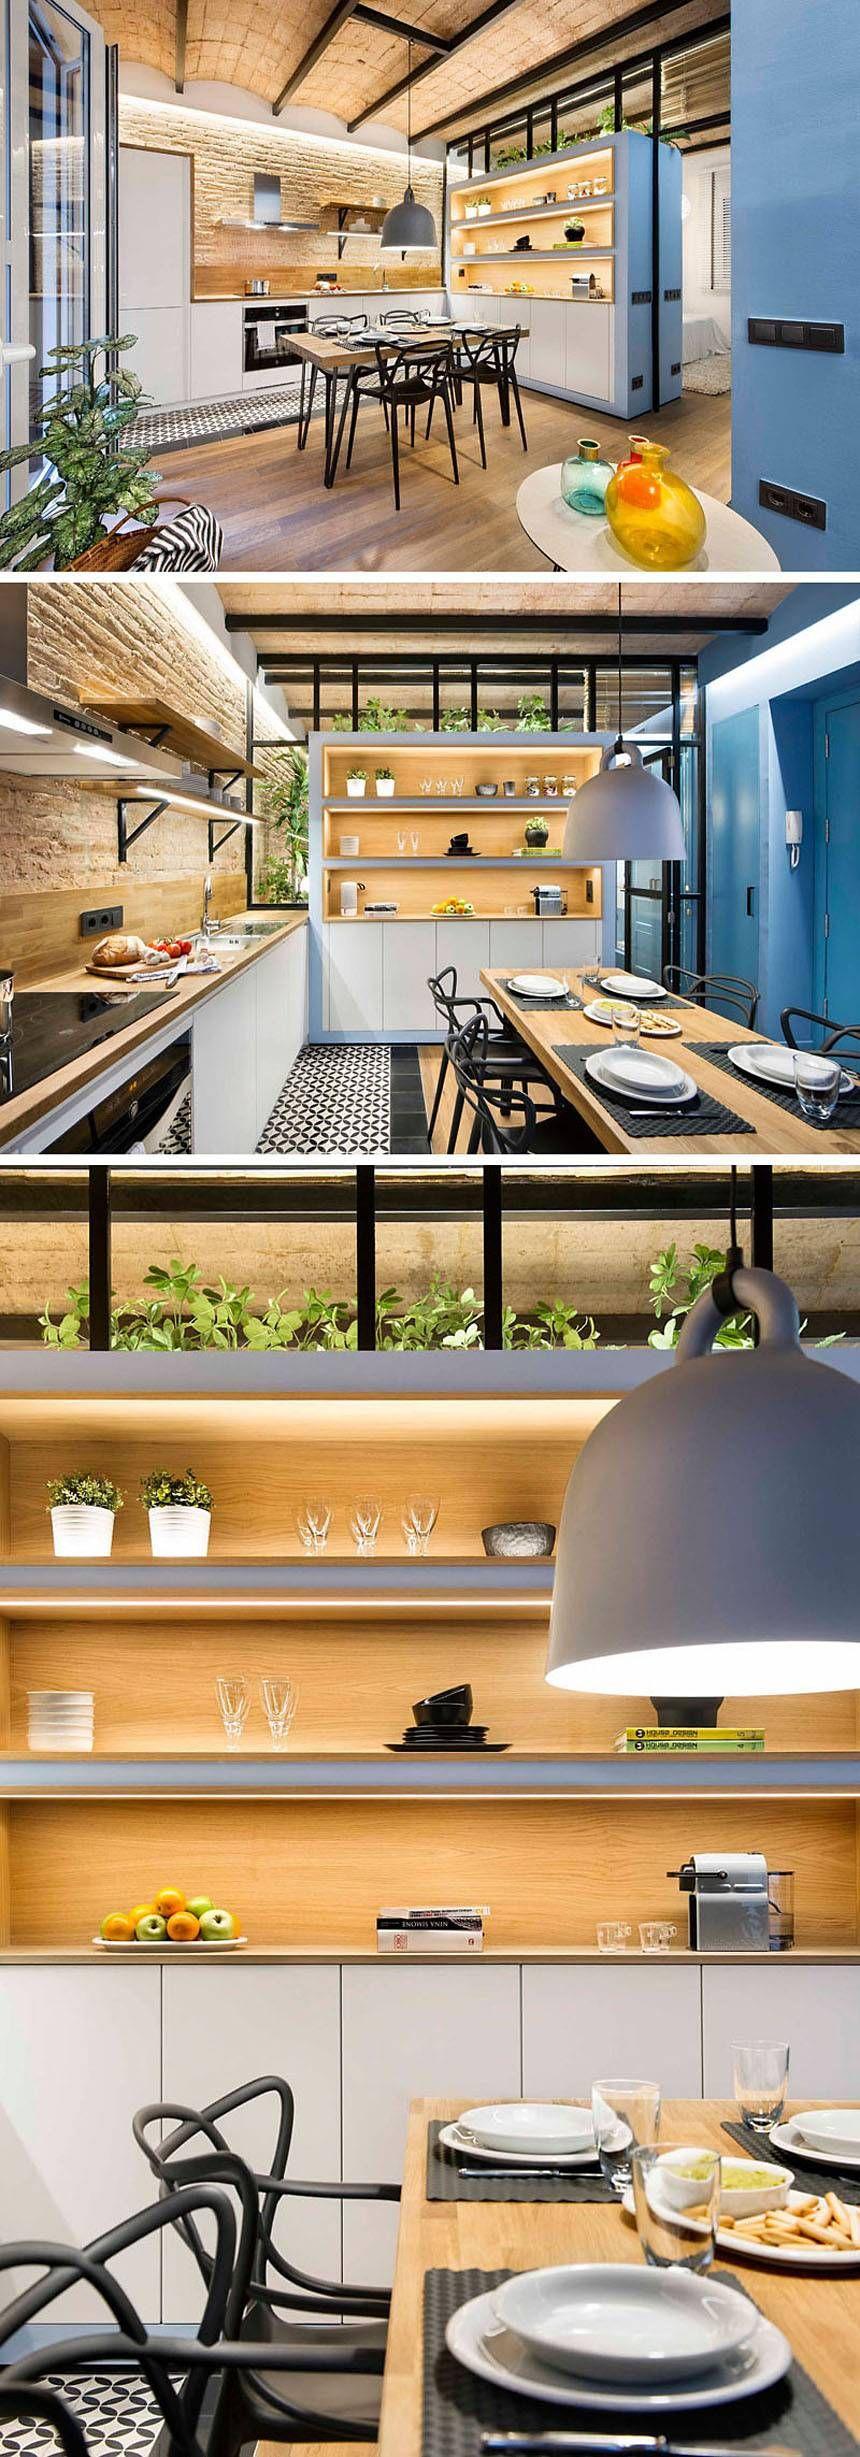 Puja zimmer fliesen modelle small apartment redesigned like an uurban beach houseu in